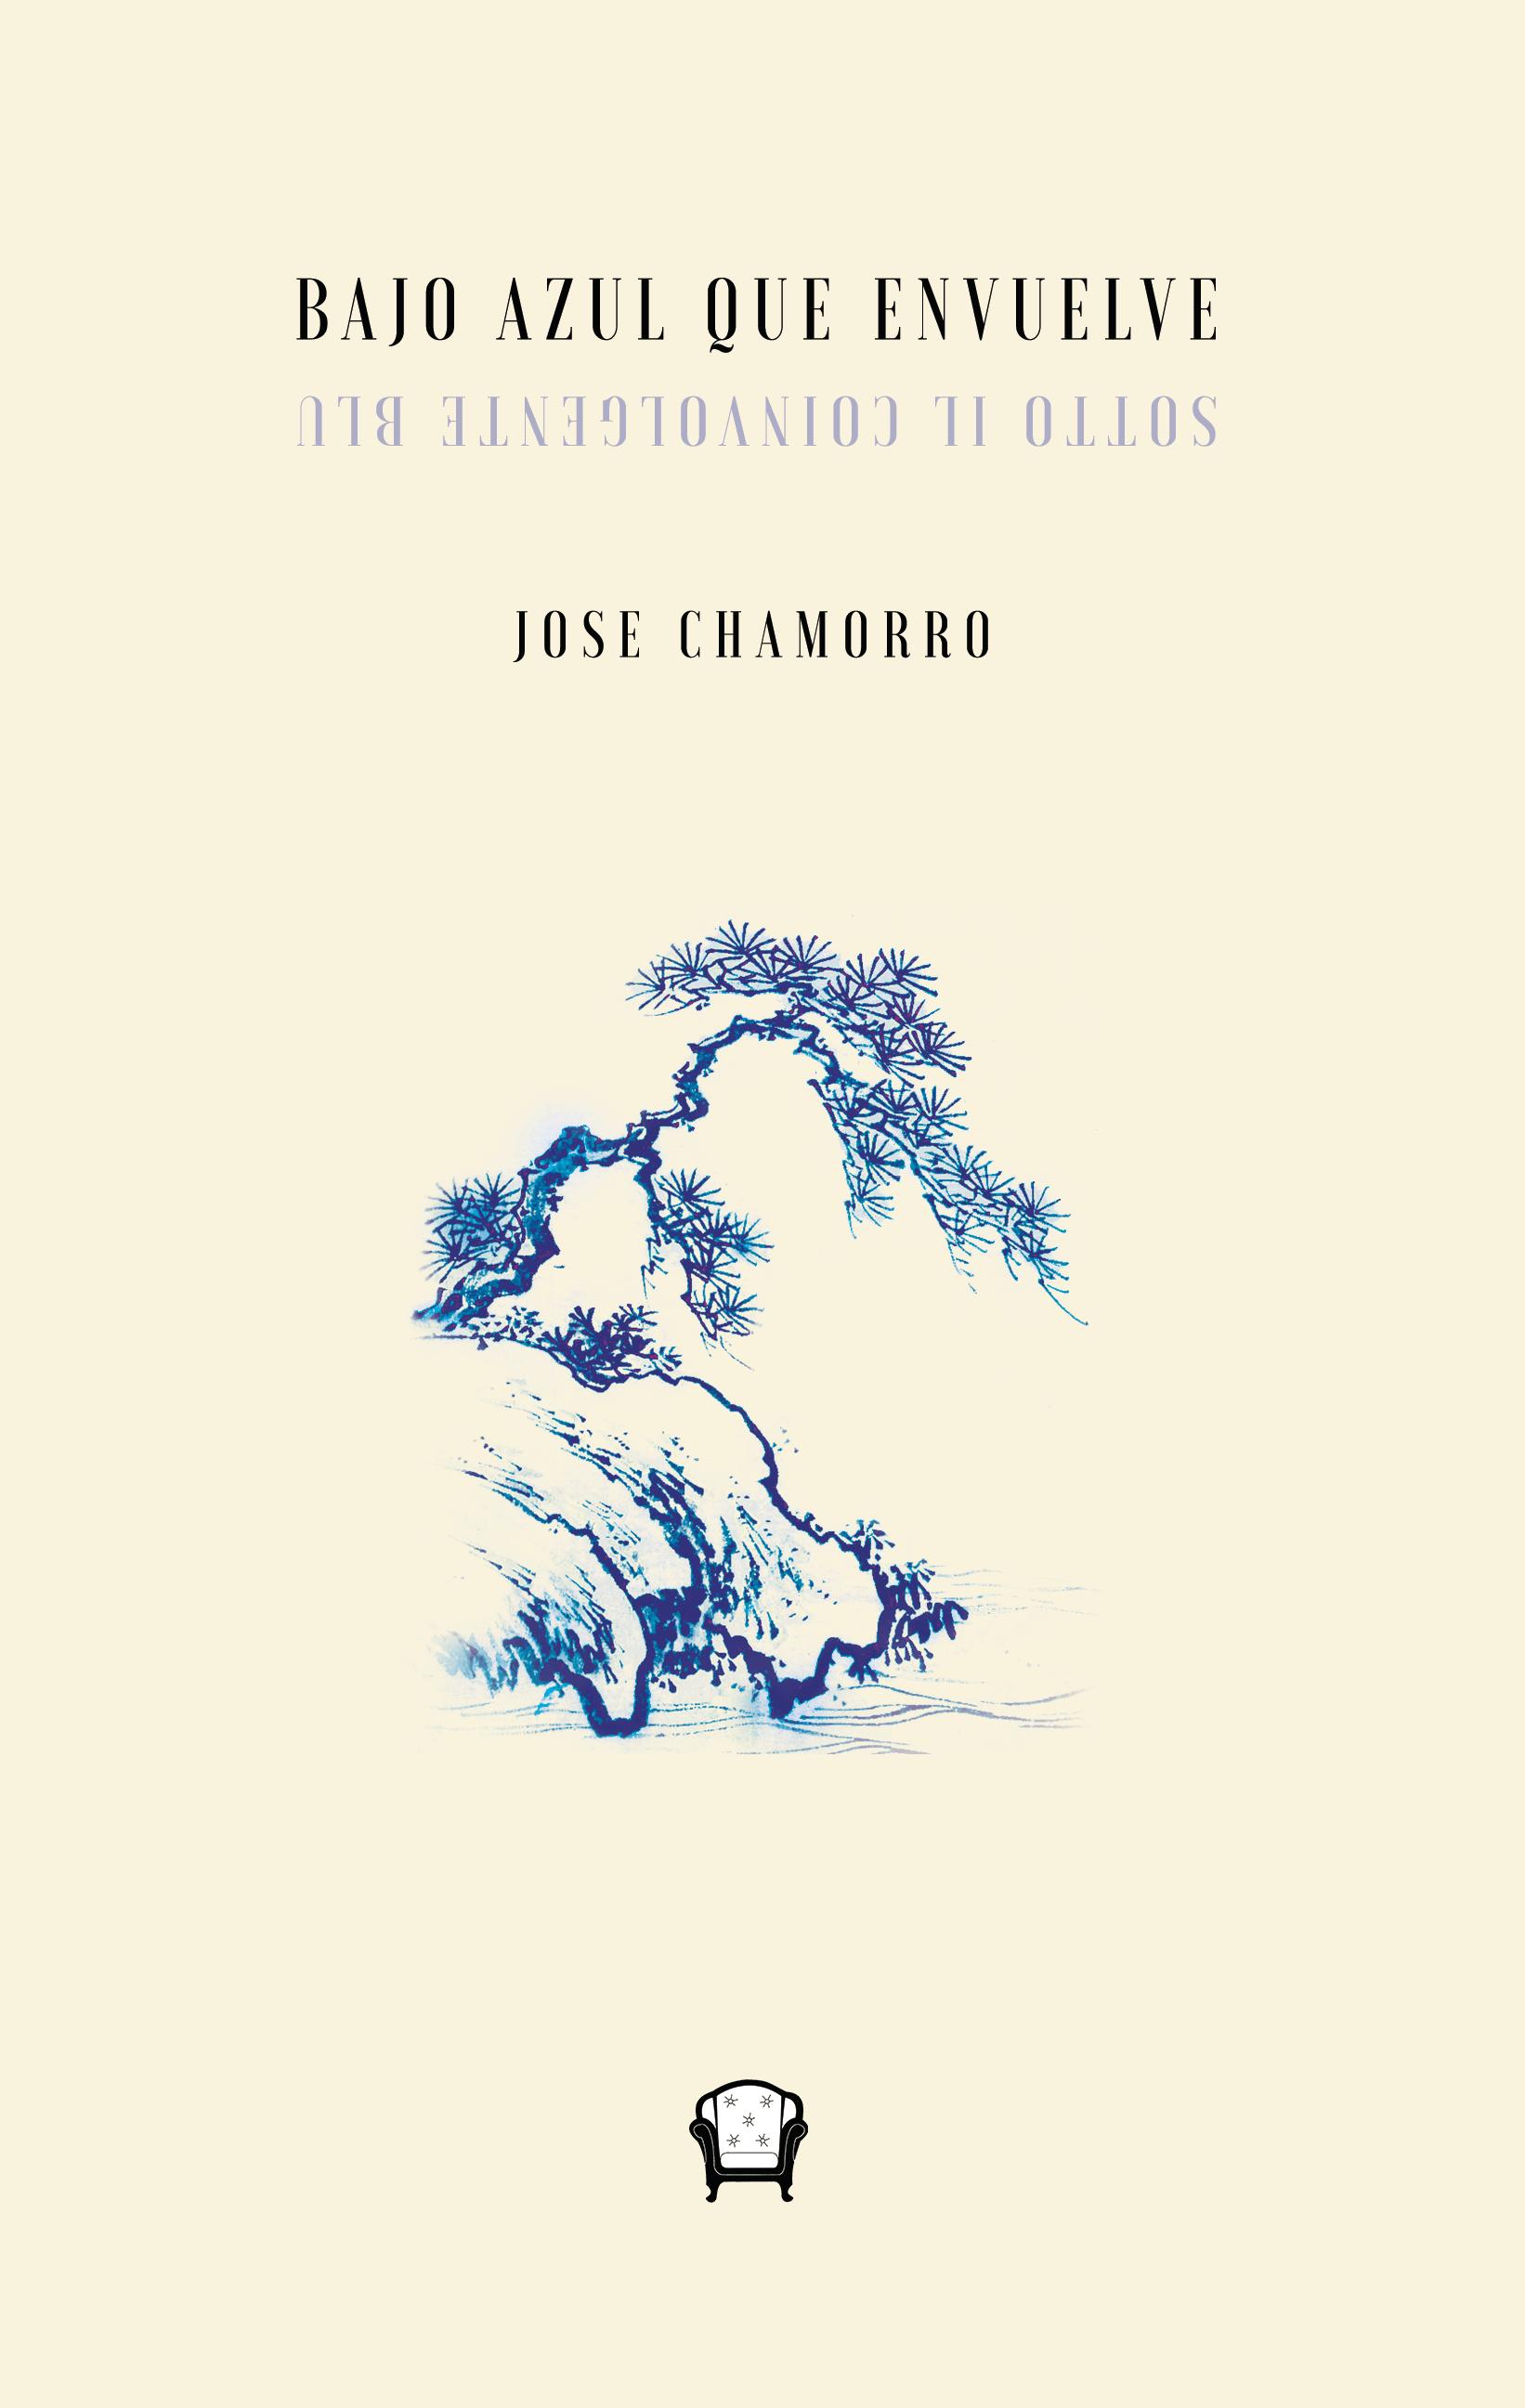 bajo-azul-que-envuelve-2019